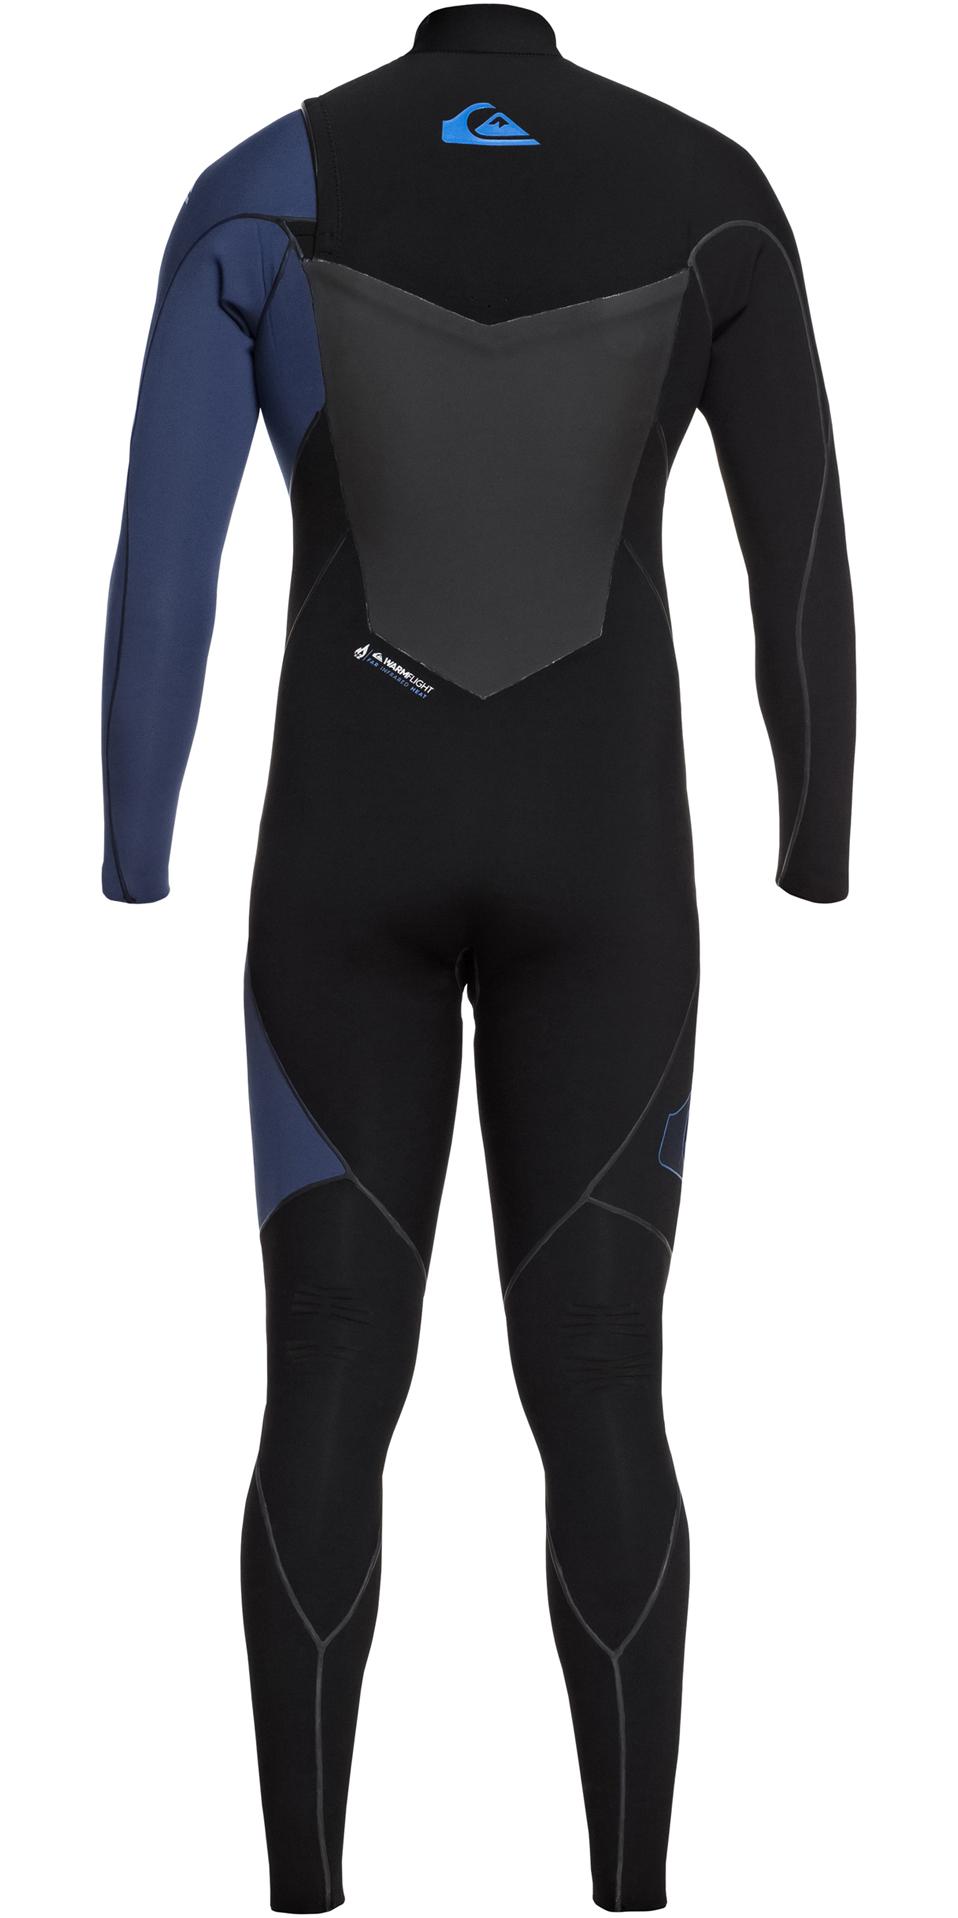 2019 Quiksilver Highline Plus 3/2mm Chest Zip Wetsuit Black / Iodine Blue EQYW103060